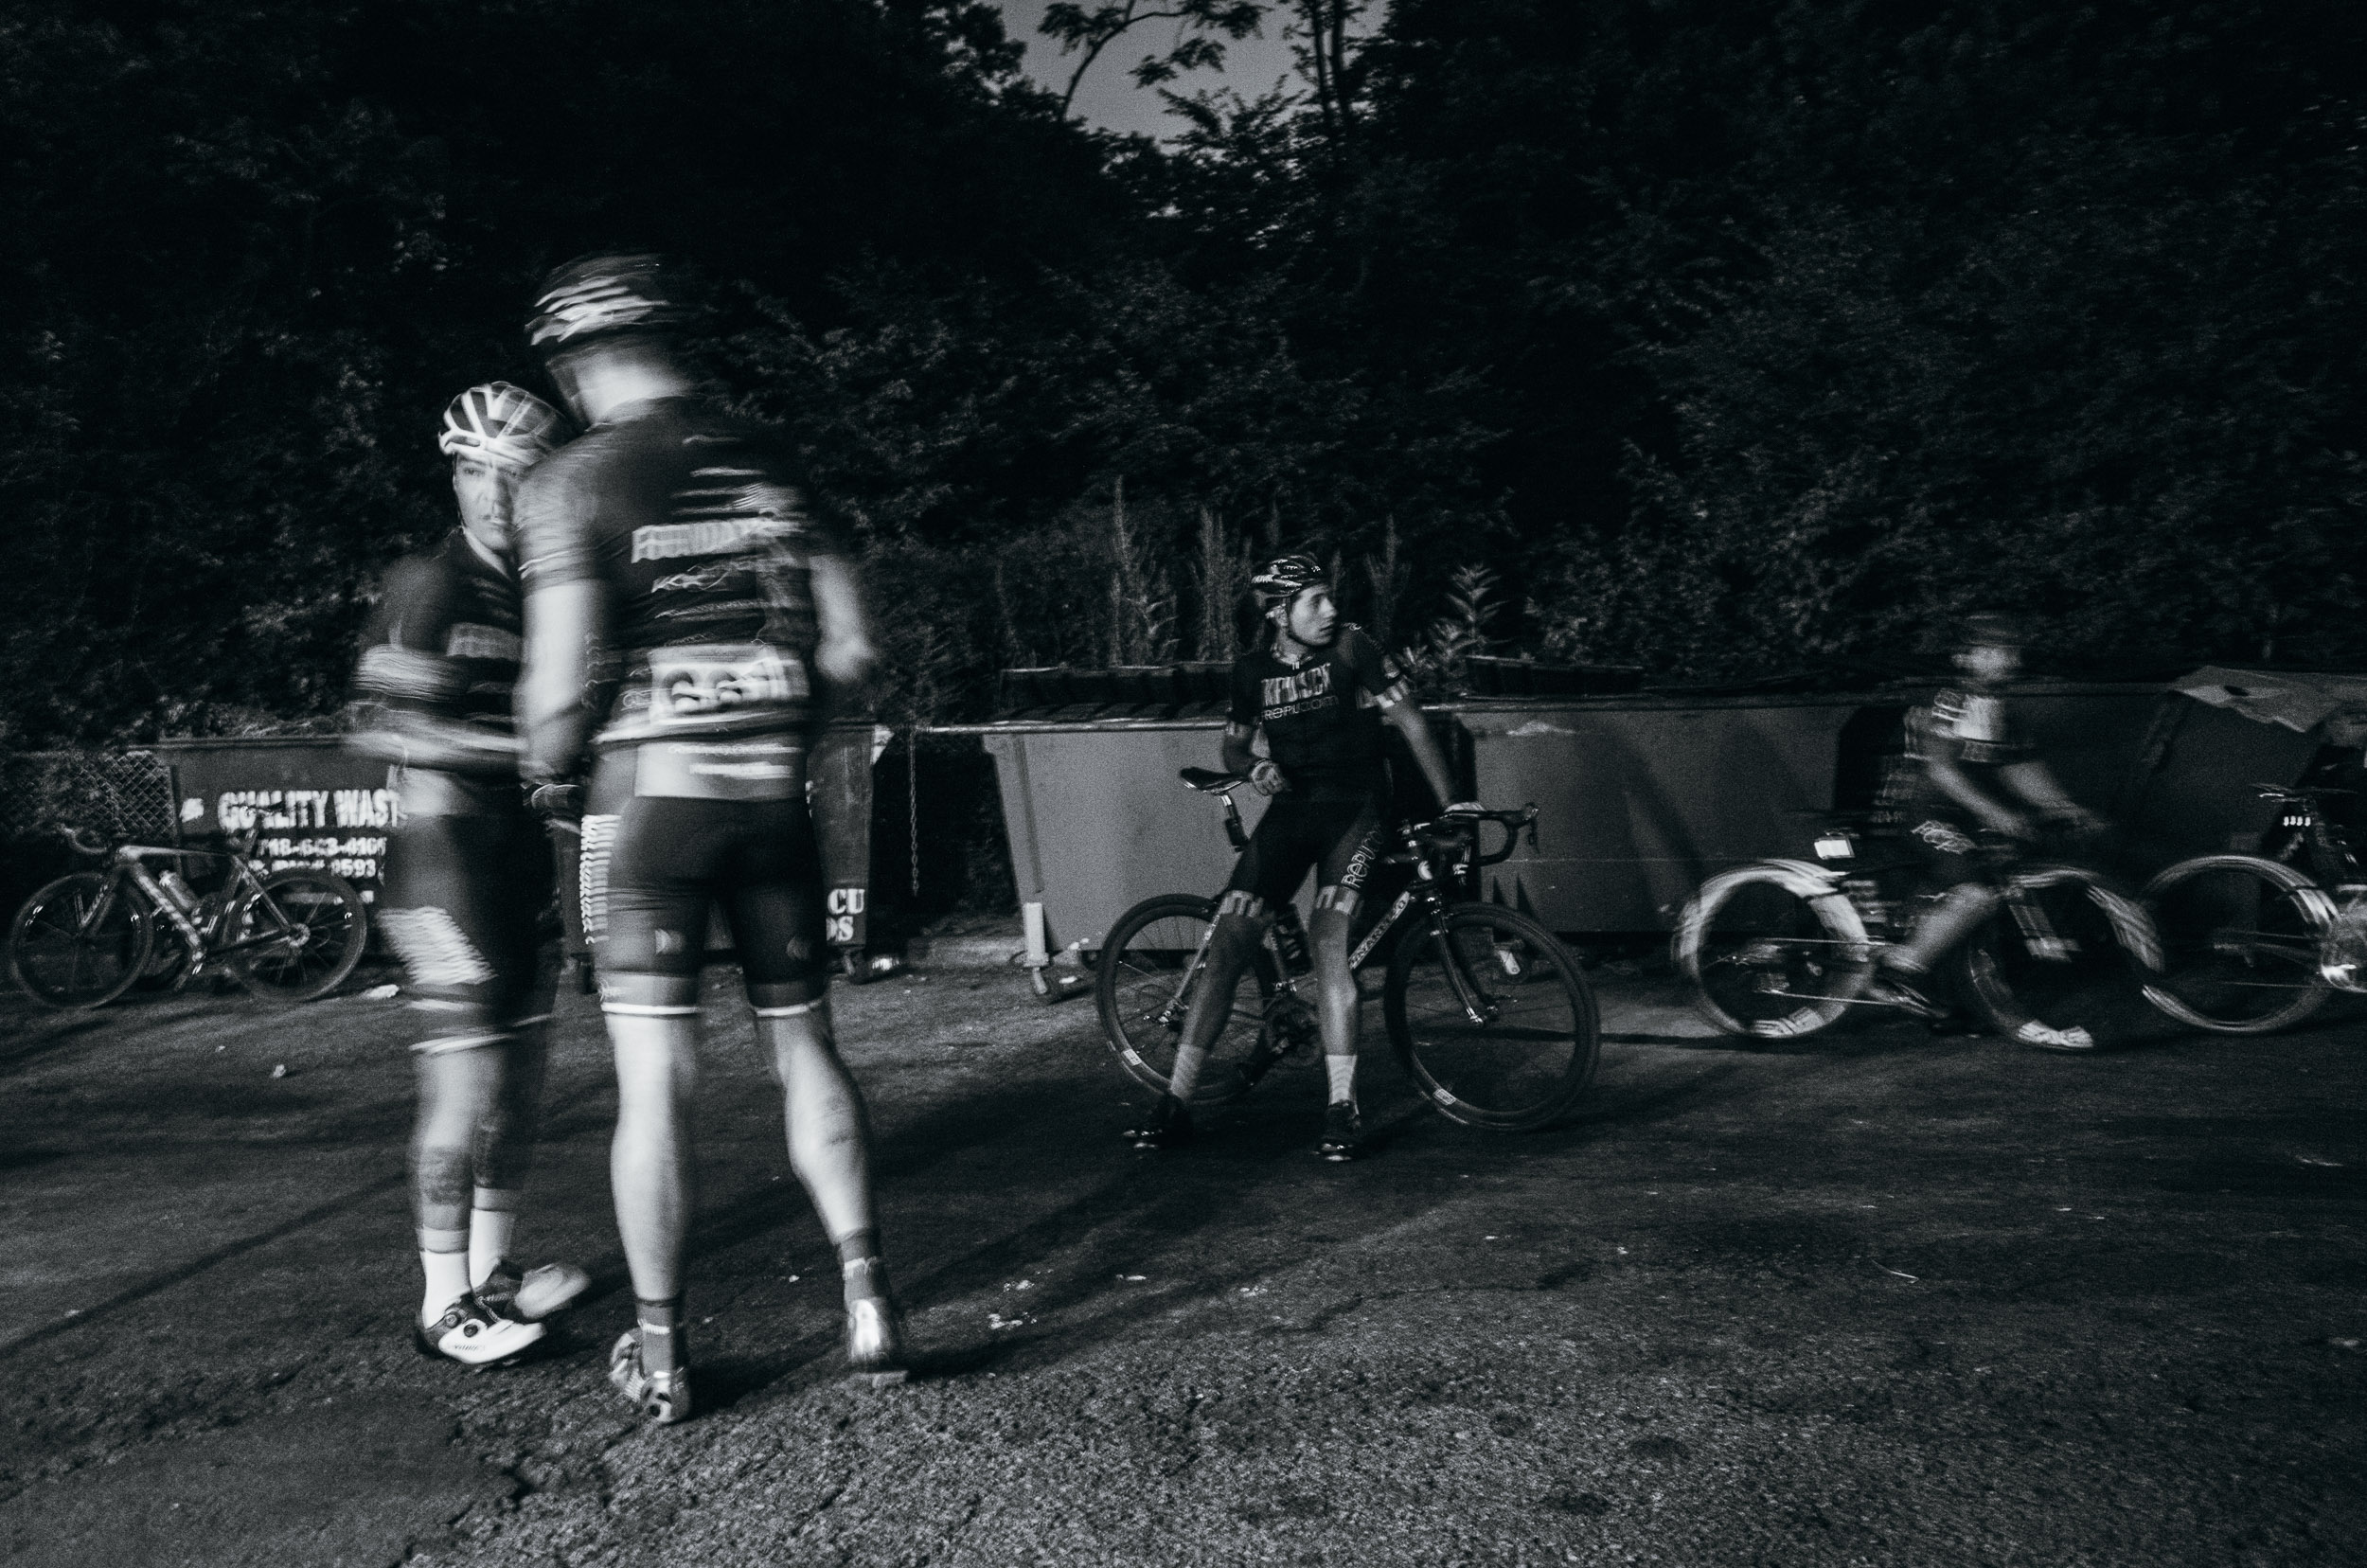 photo-rhetoric-to-be-determined-crca-club-race-107.jpg